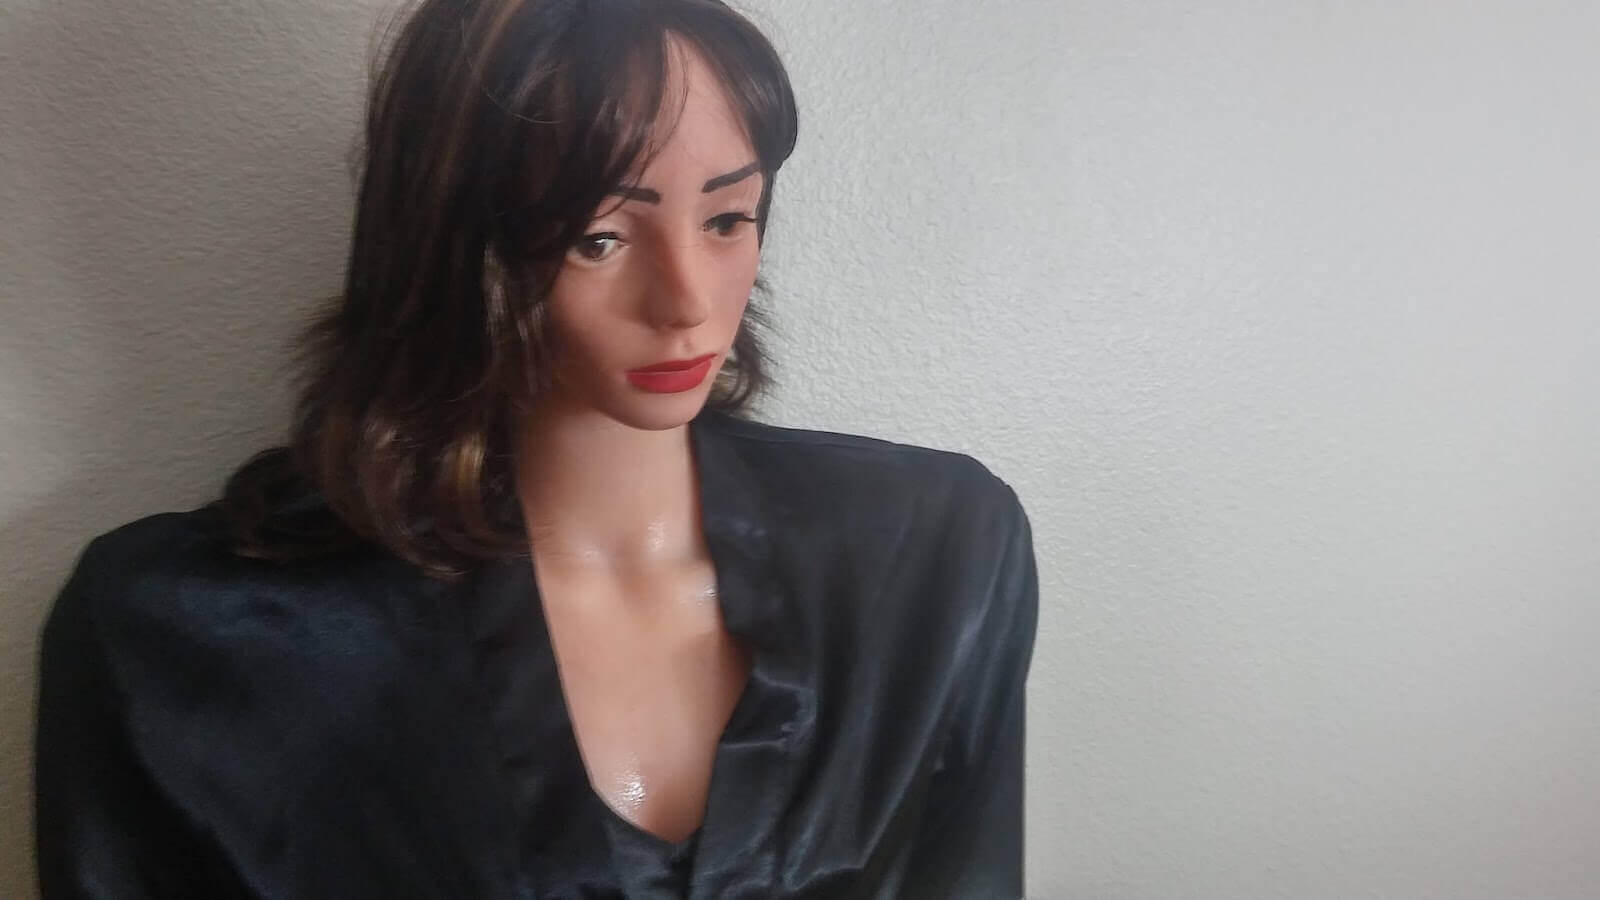 Eden Robotics created a sexbot prototype called Eva.